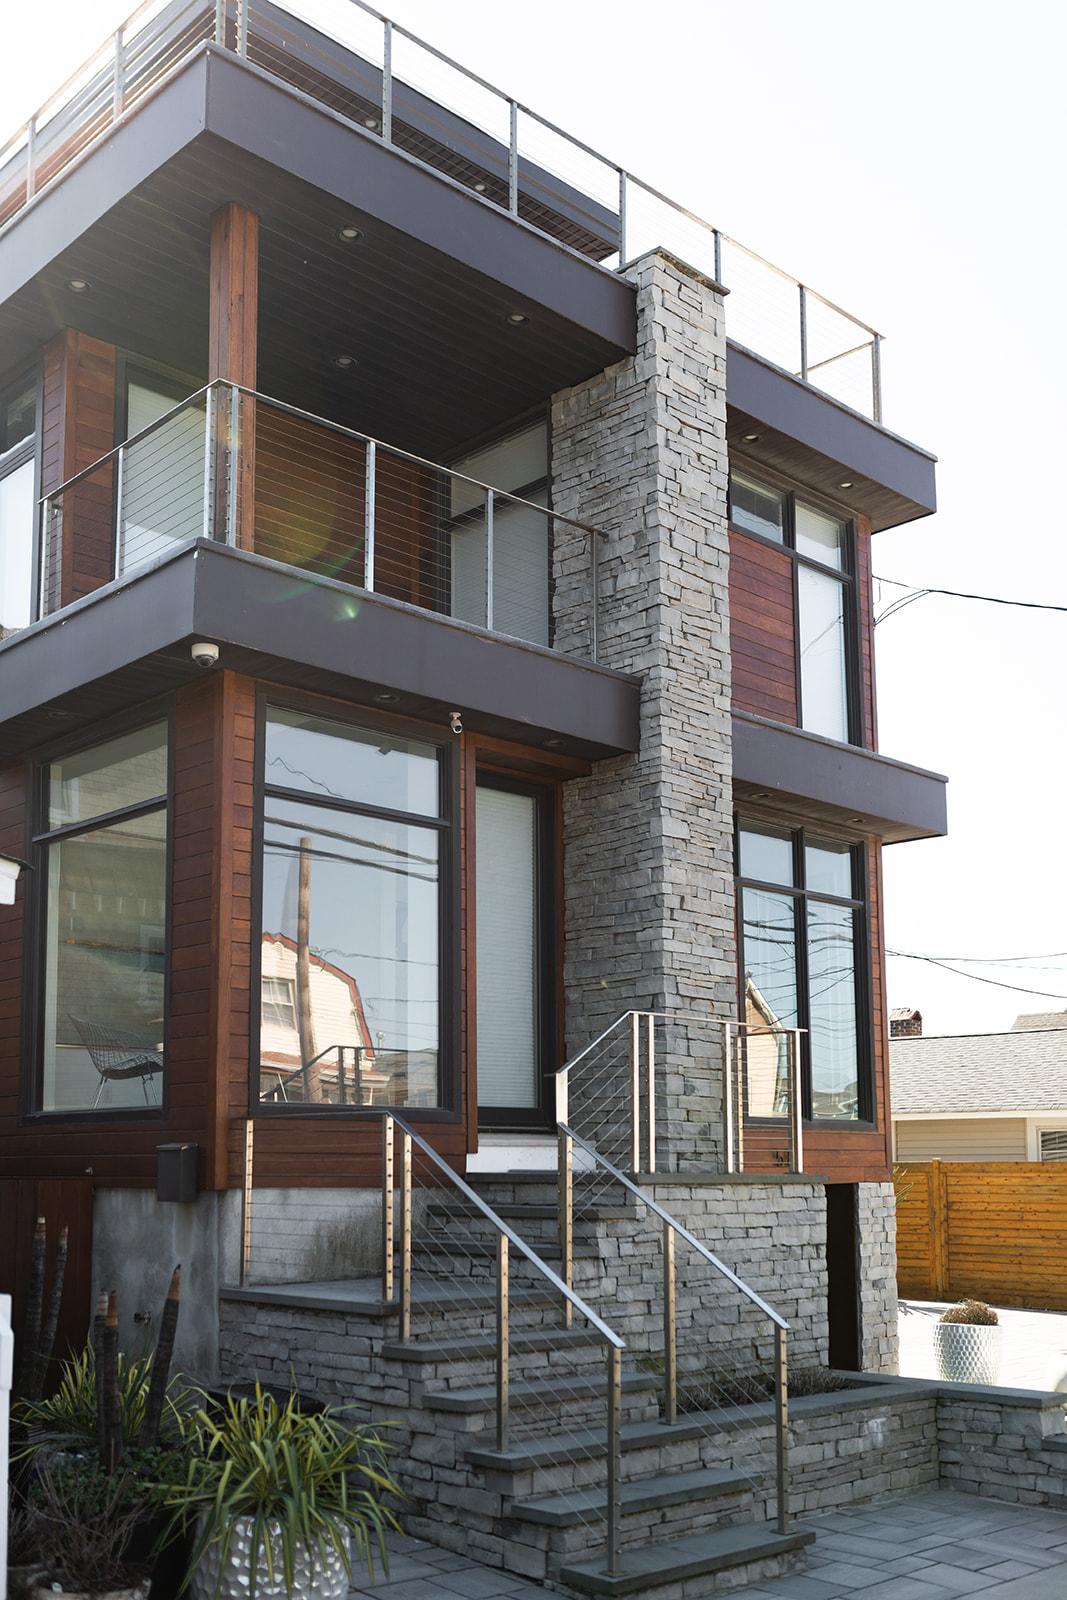 McHugh Architecture